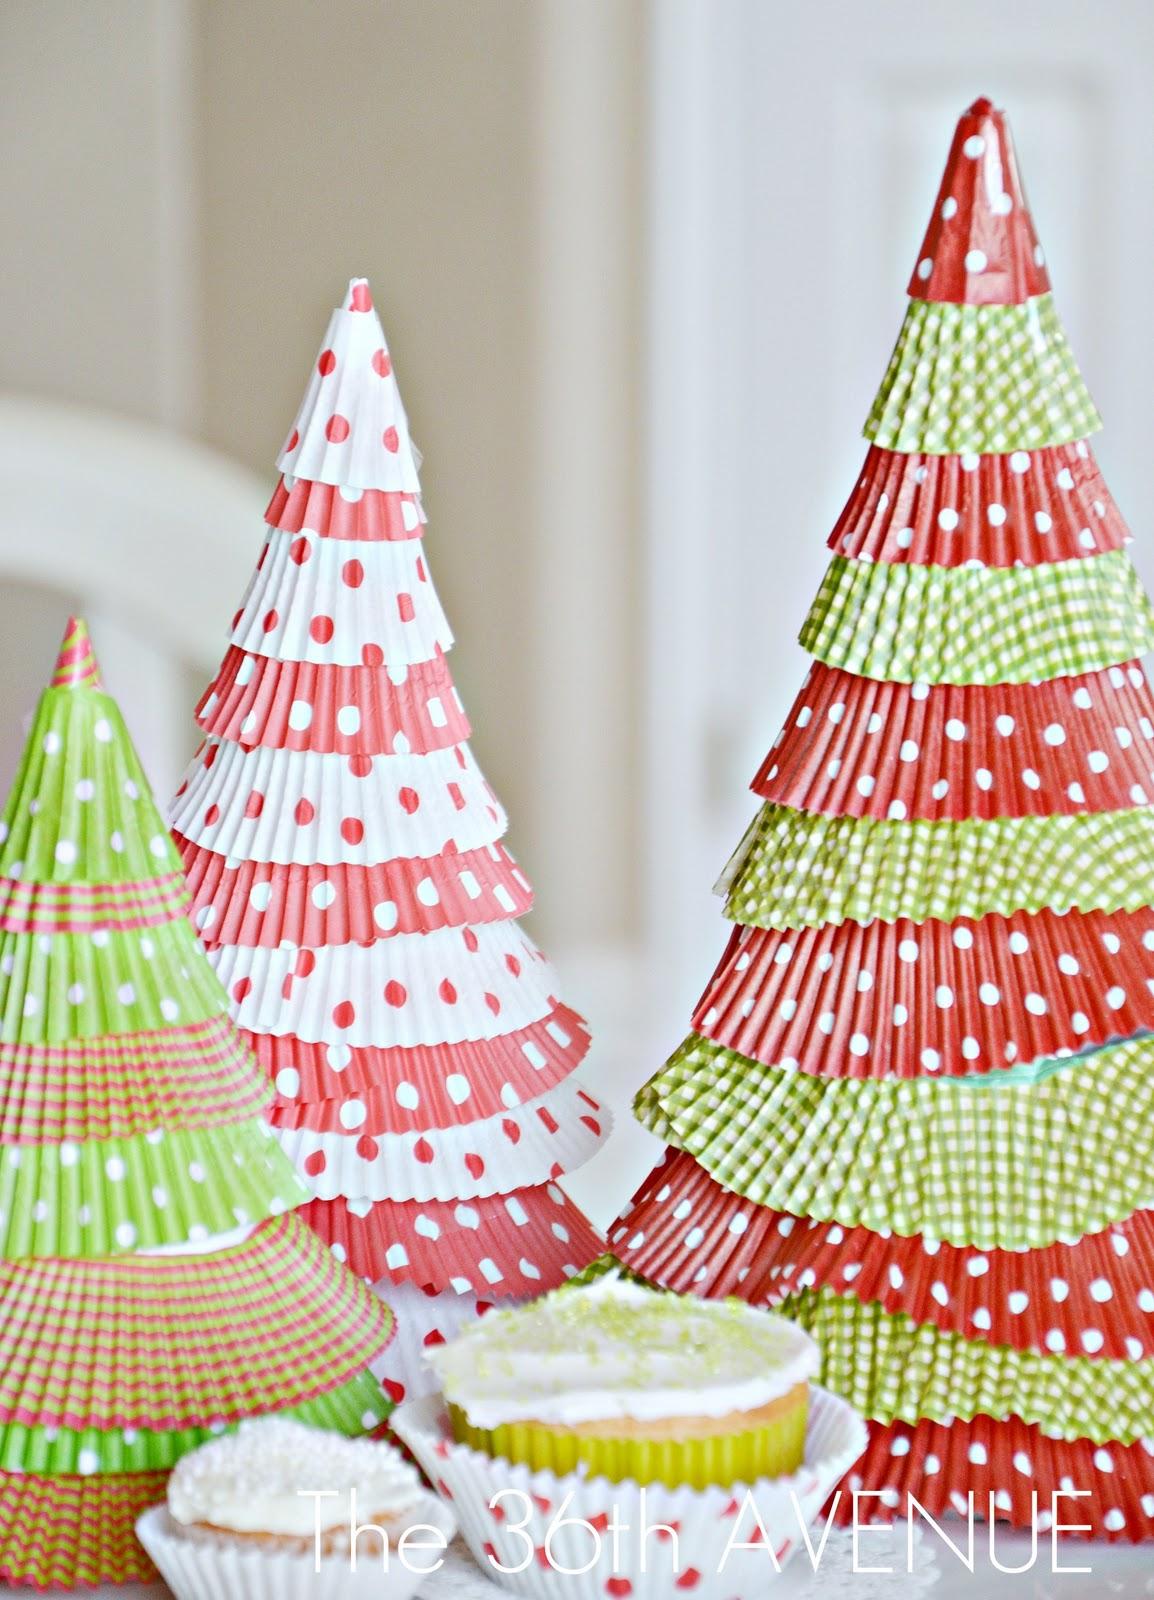 Make cupcake liner christmas trees holiday tutorial tatertots and jello - Bastelideen pinterest ...